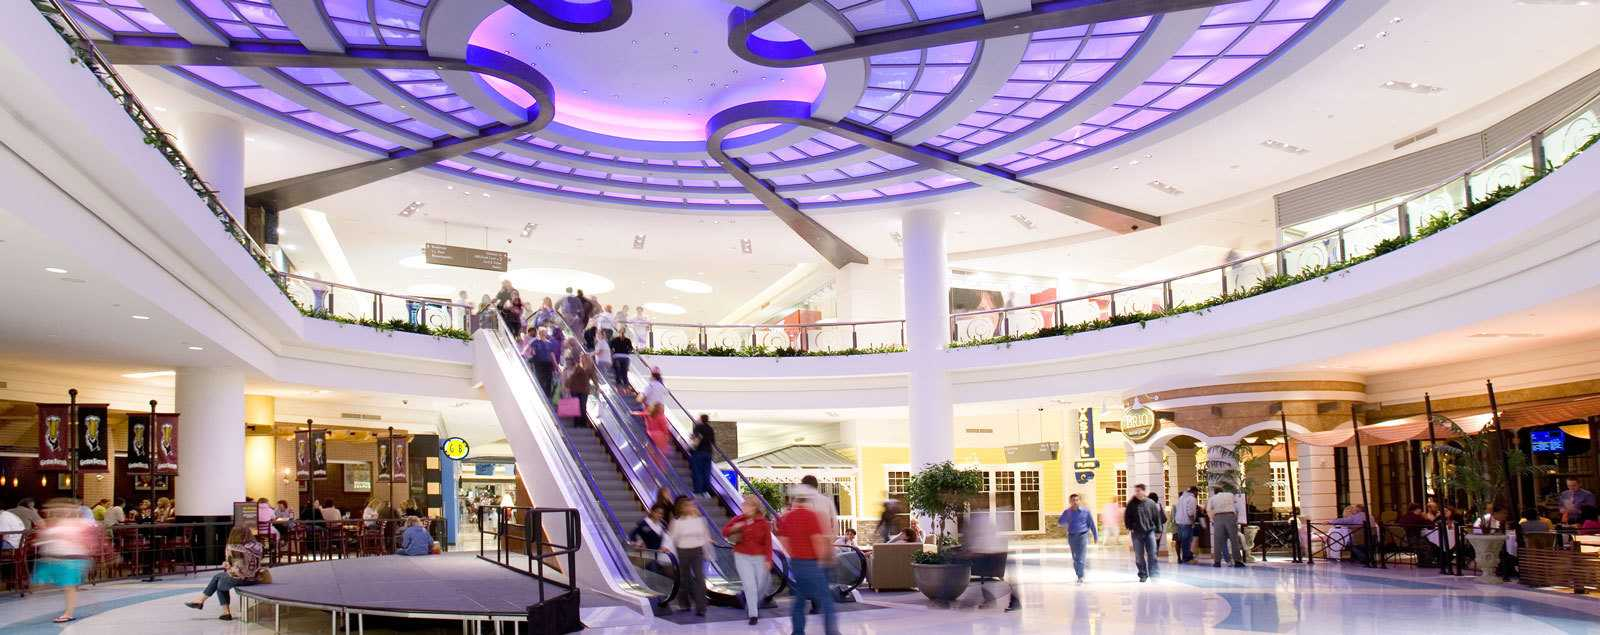 Fairfax Shopping Best Shopping In Northern Virginia Fairfax County Va